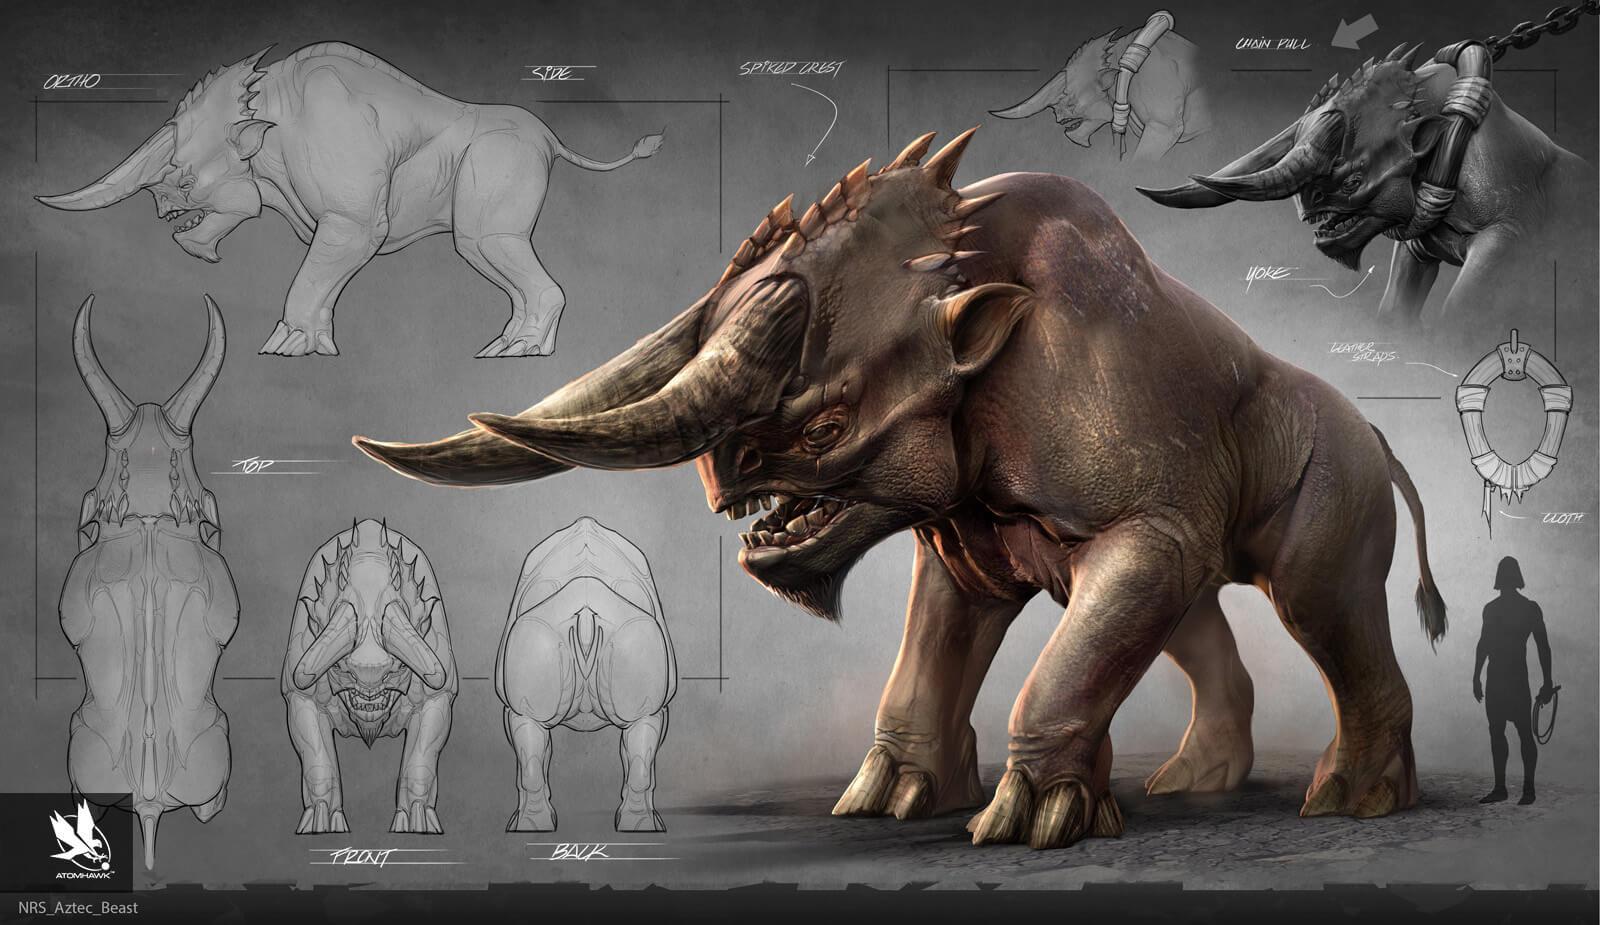 Atomhawk - Mortal Kombat X - Prop Design - Aztec Beast